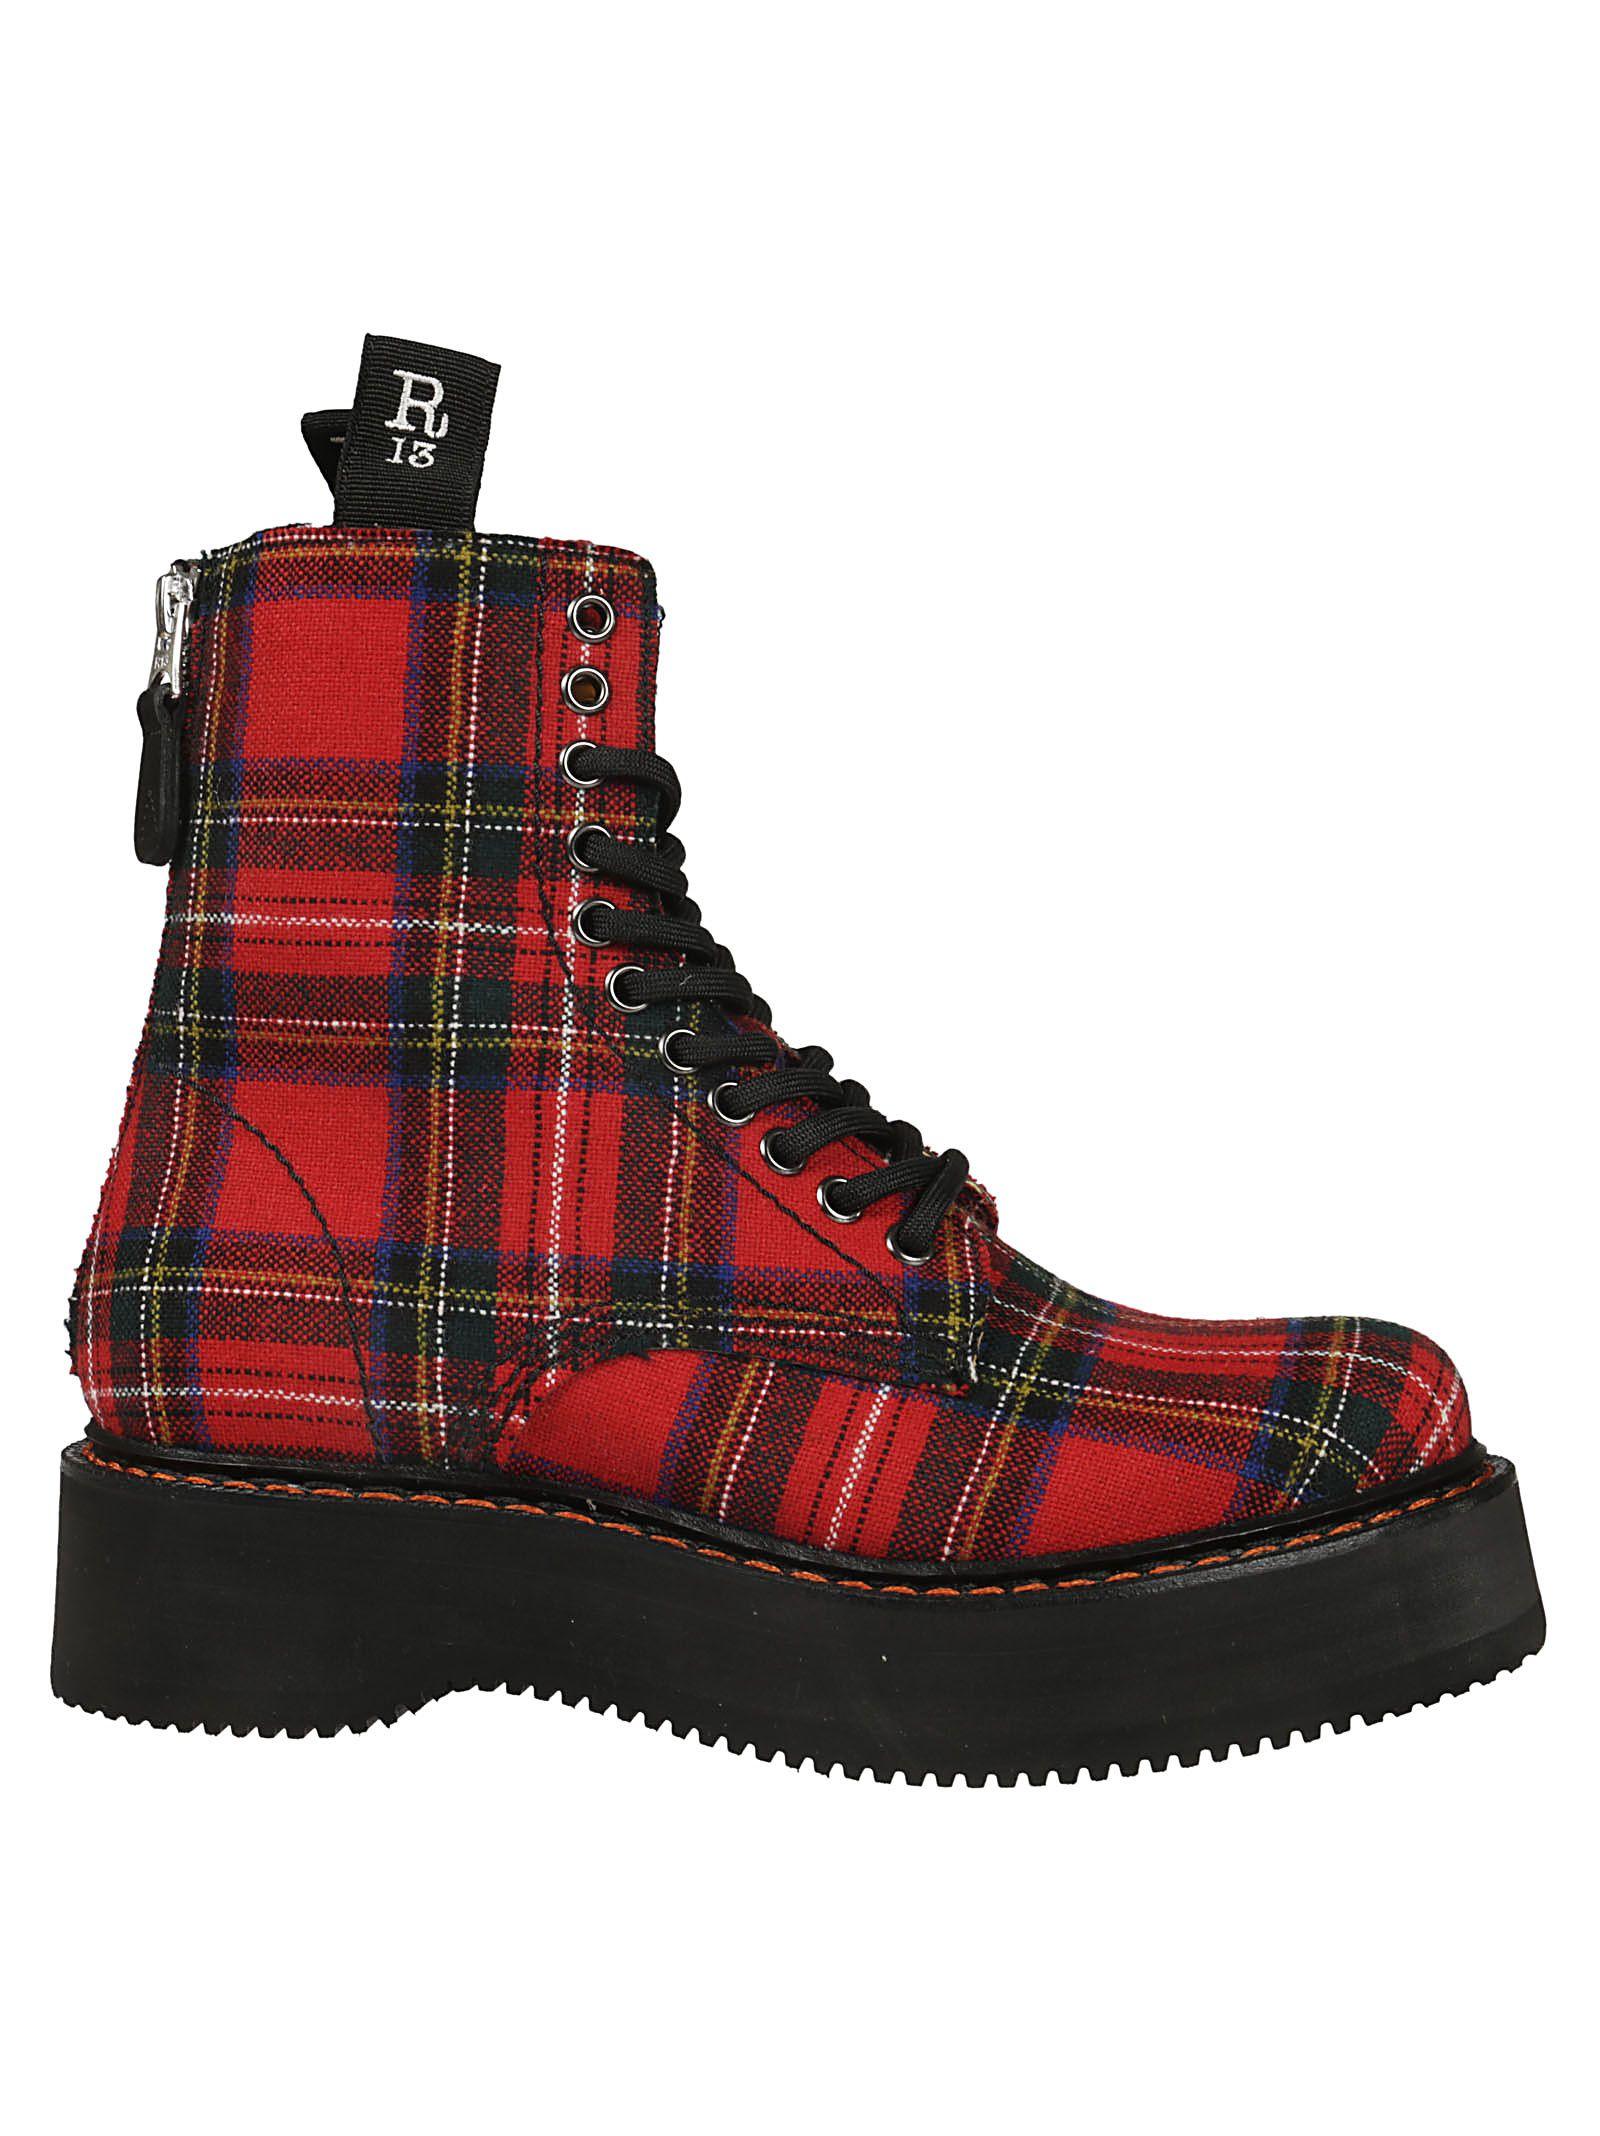 R13 Plaid Lace-up Boots